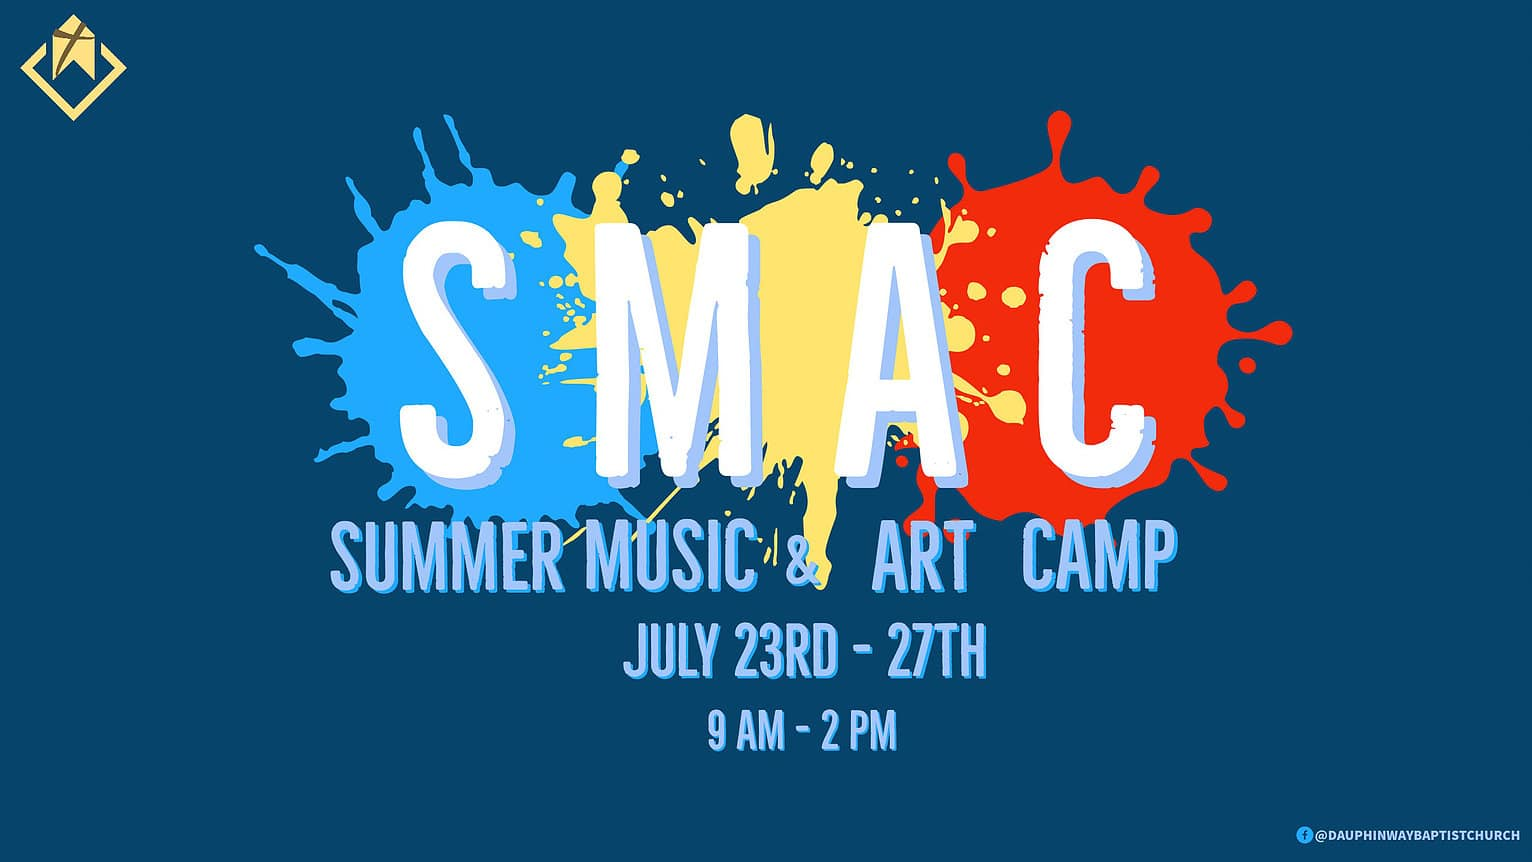 Dauphin Way Summer Music & Art Camp